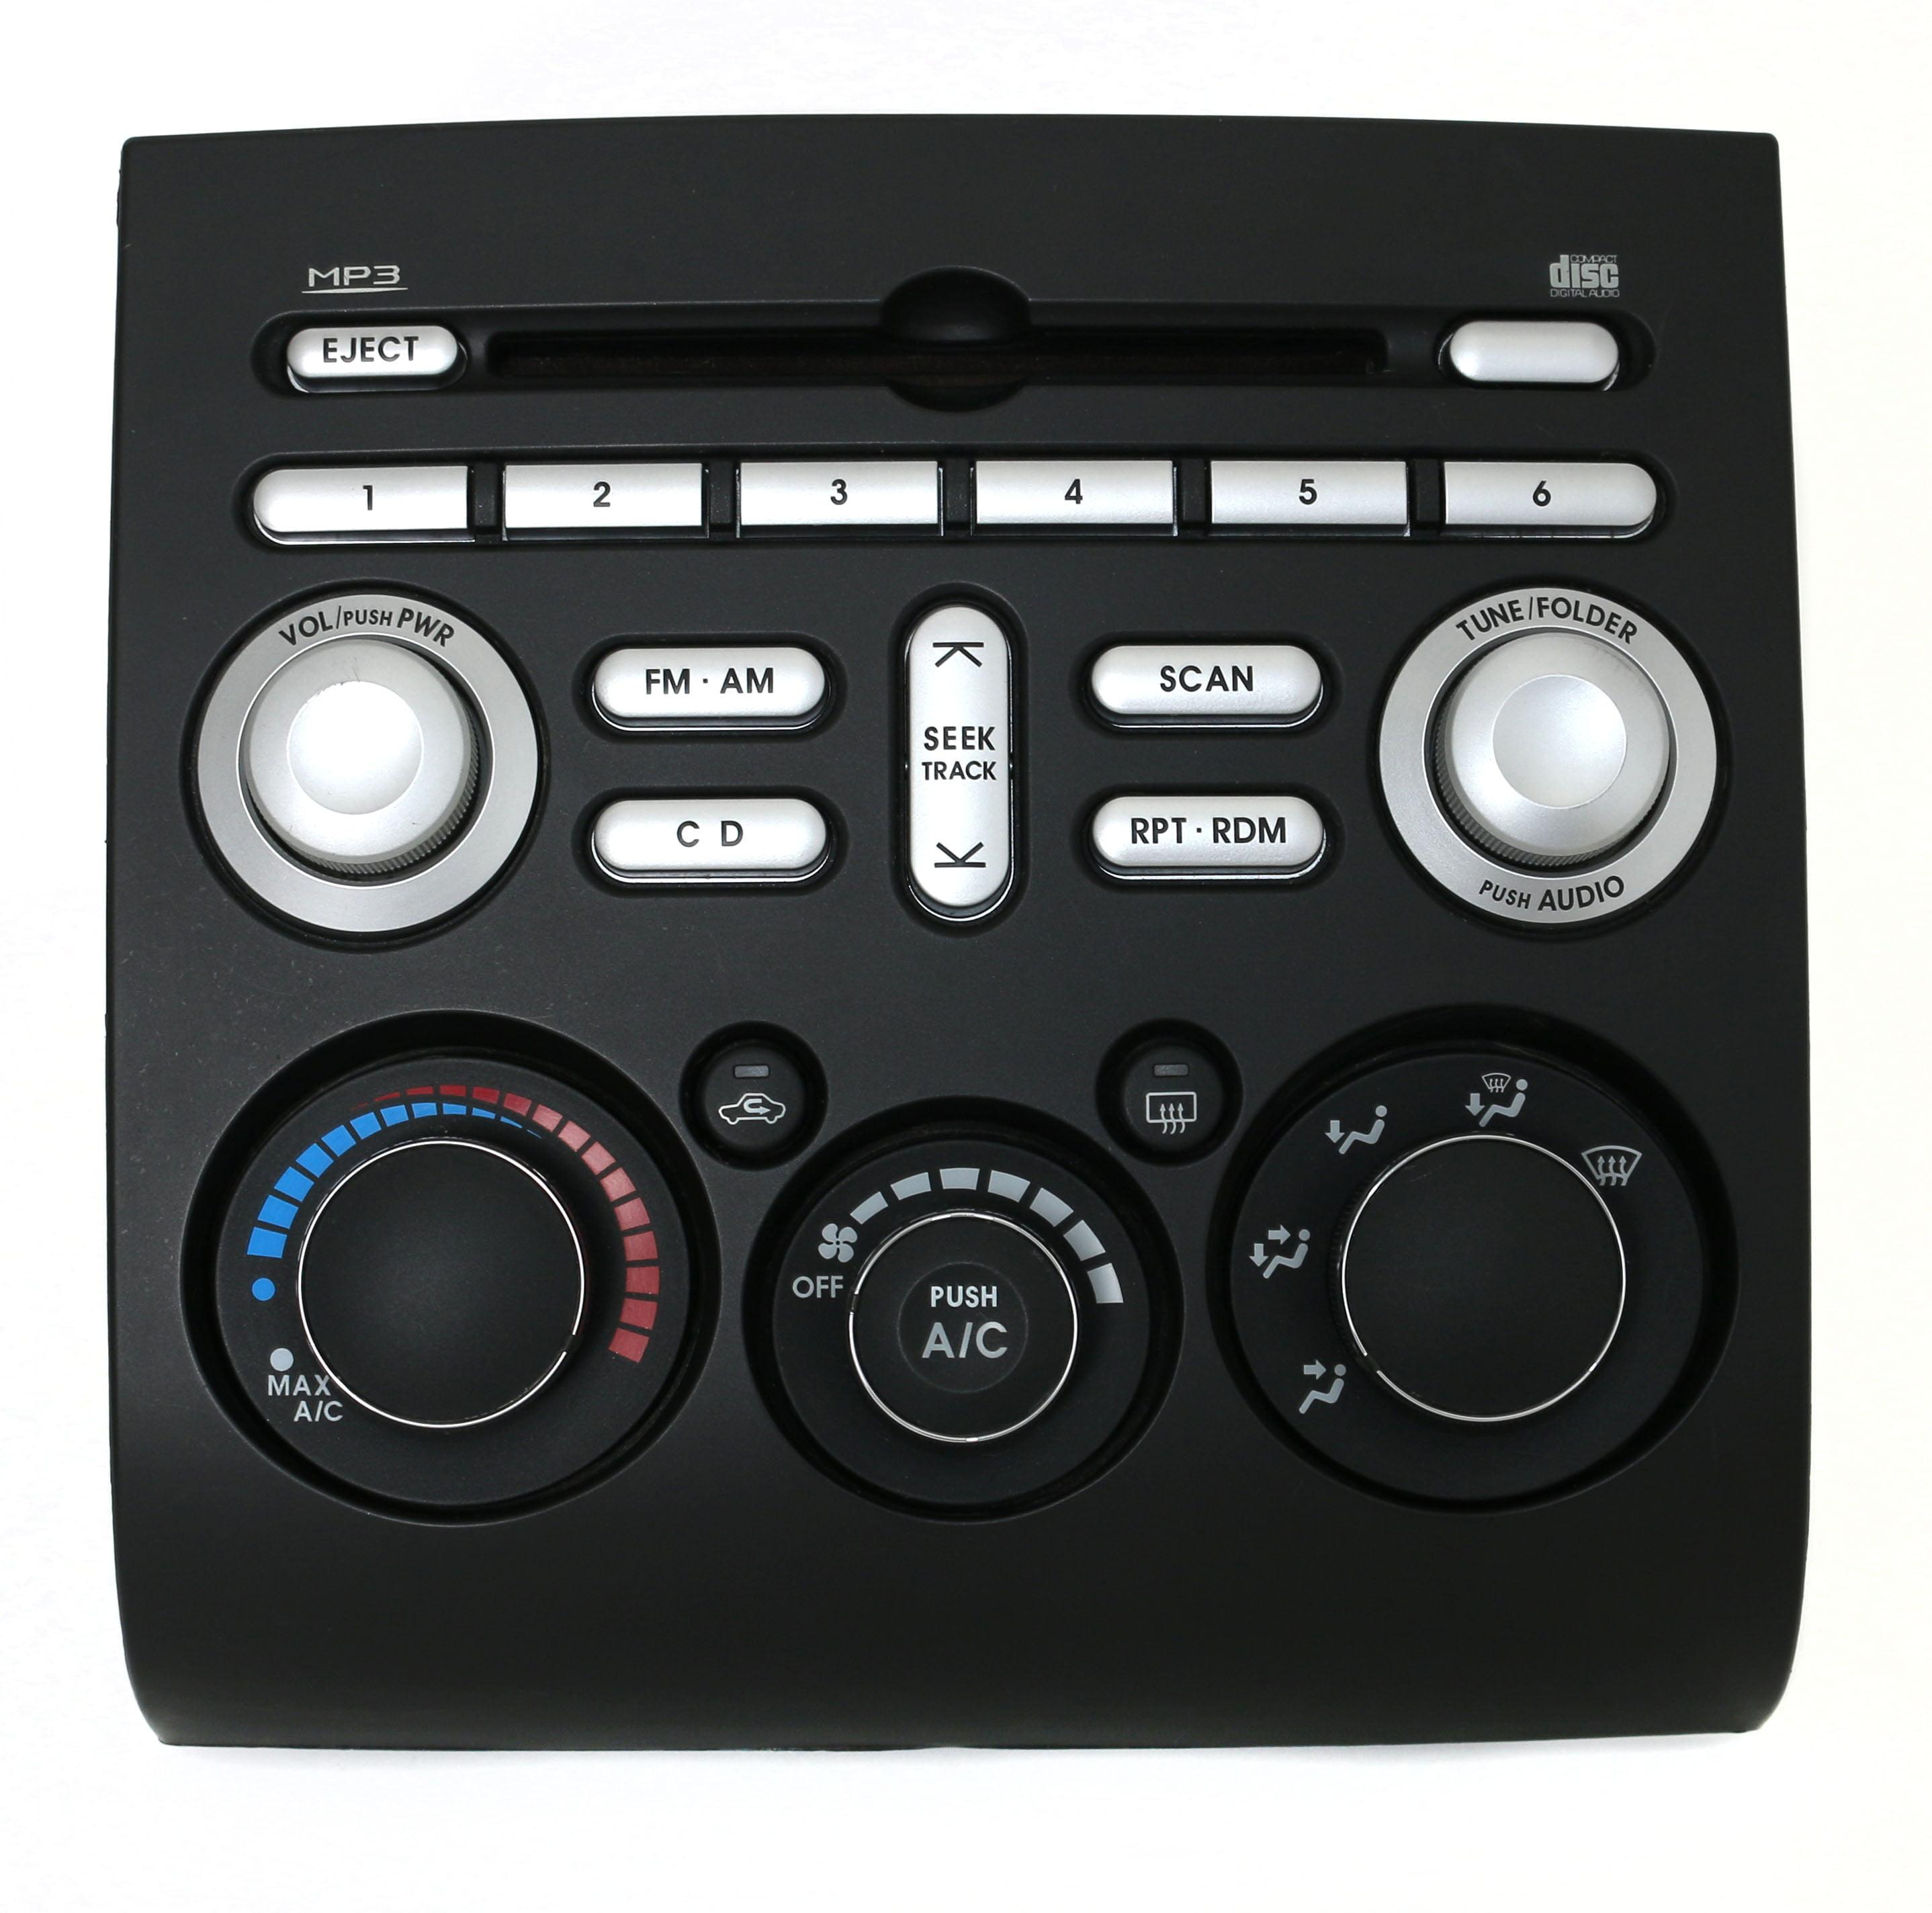 06-09 Mitsubishi Eclipse Endeavor Galant AM FM Radio mp3 CD Temp Cntrls 8701A045 Refurbished by Mitsubishi